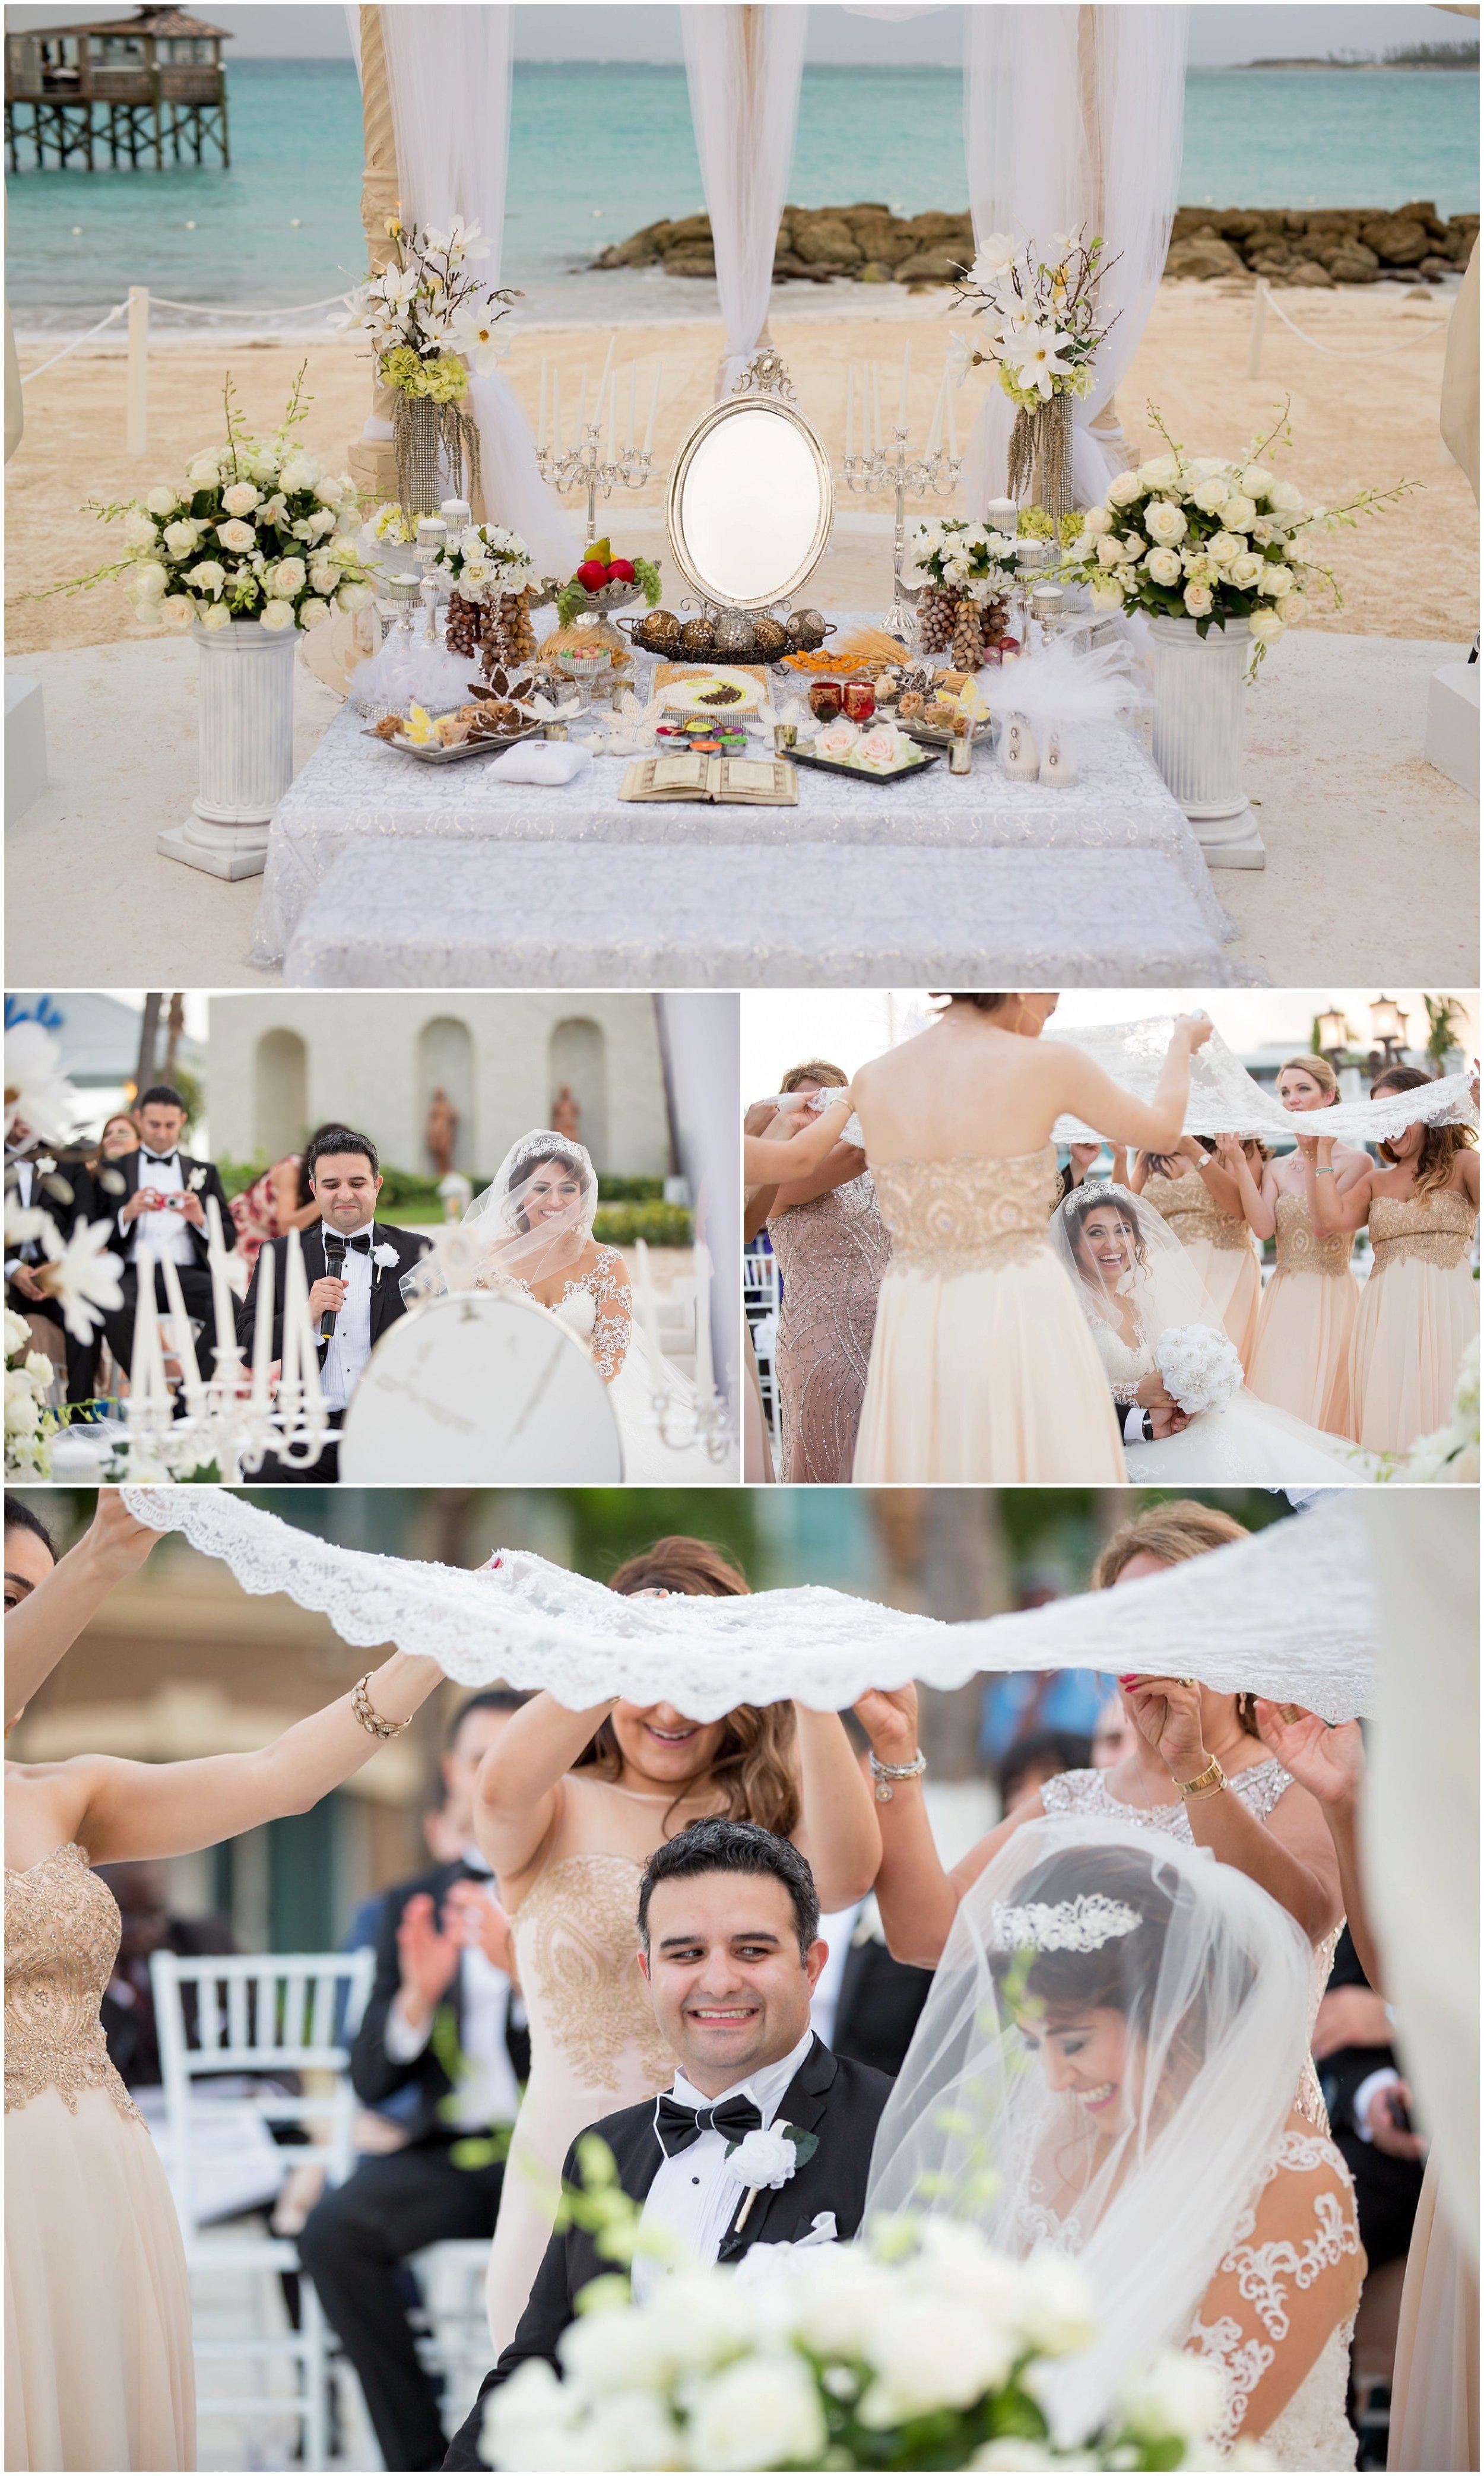 Le Cape Weddings- Destination Wedding Photography -ShayanandNikkie-352-X3_LuxuryDestinationPhotographer.jpg